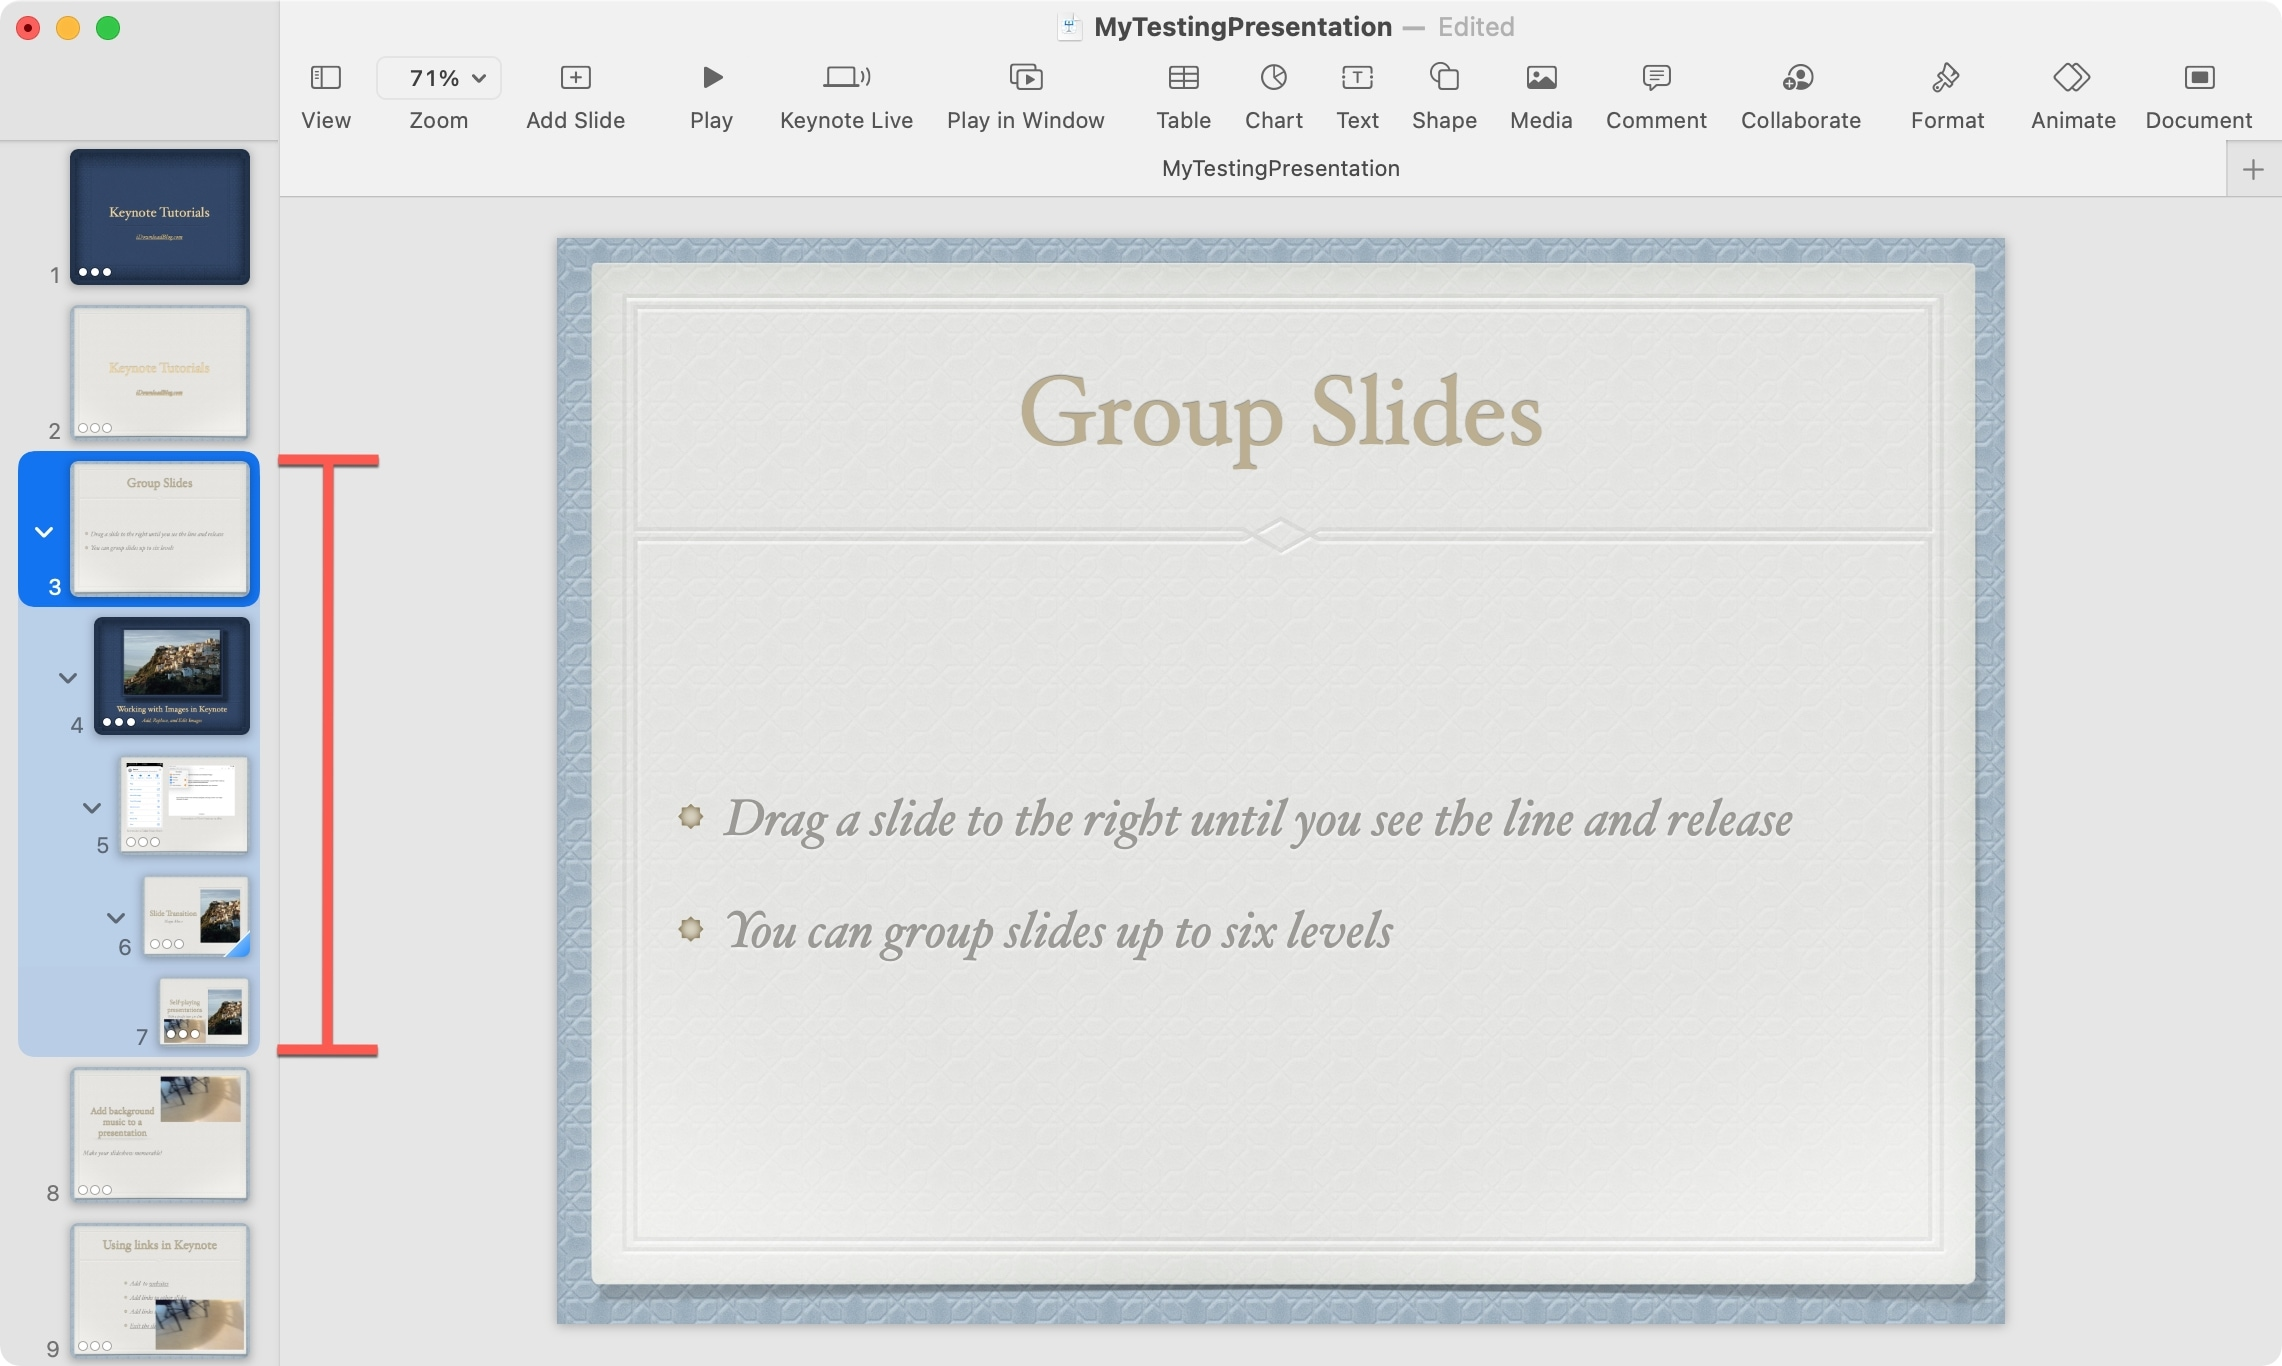 Grouped Slides Levels in Keynote on Mac